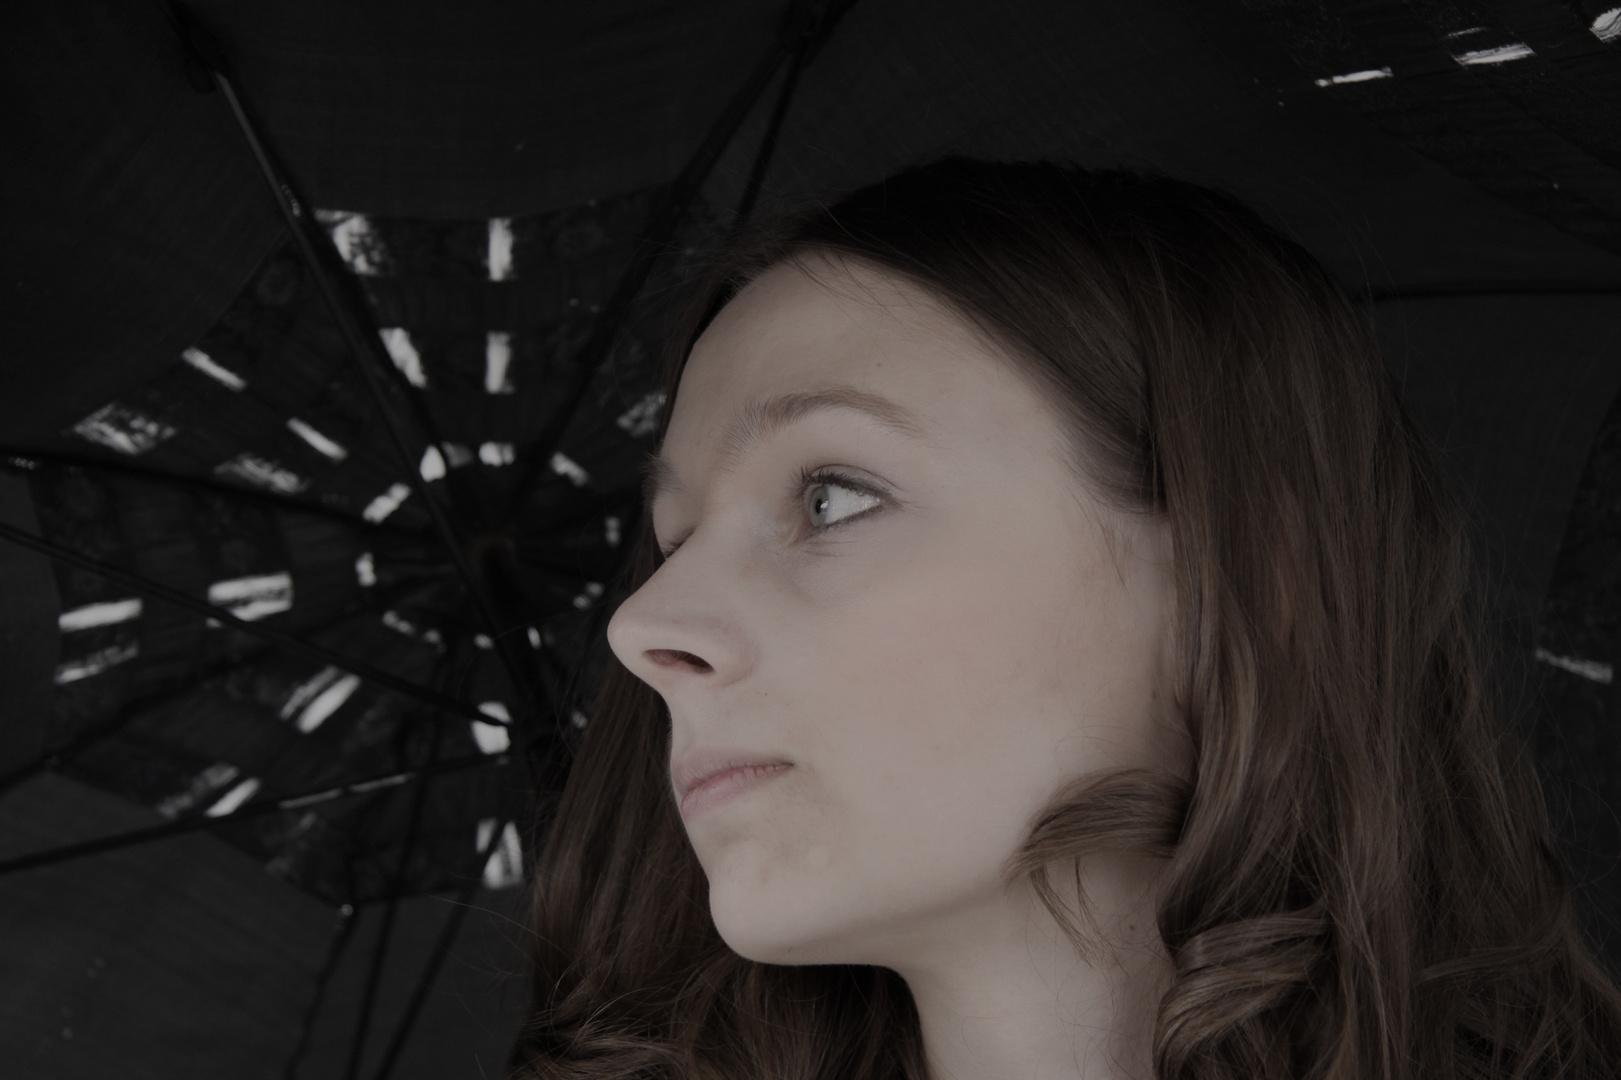 De Middelburghsche parasol